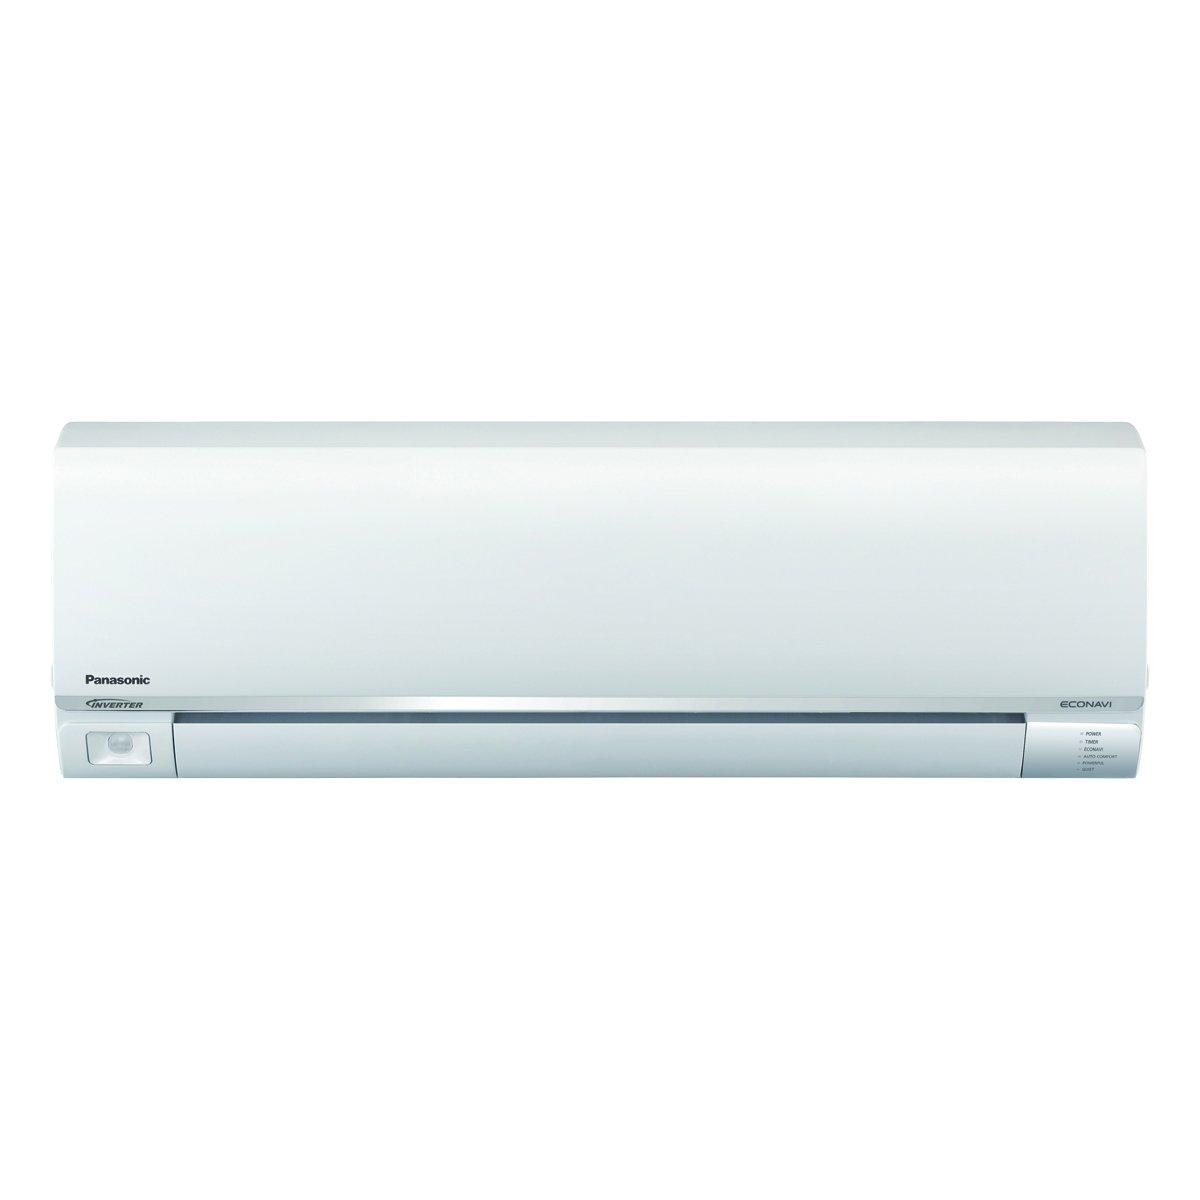 Panasonic econavi inverter aircon